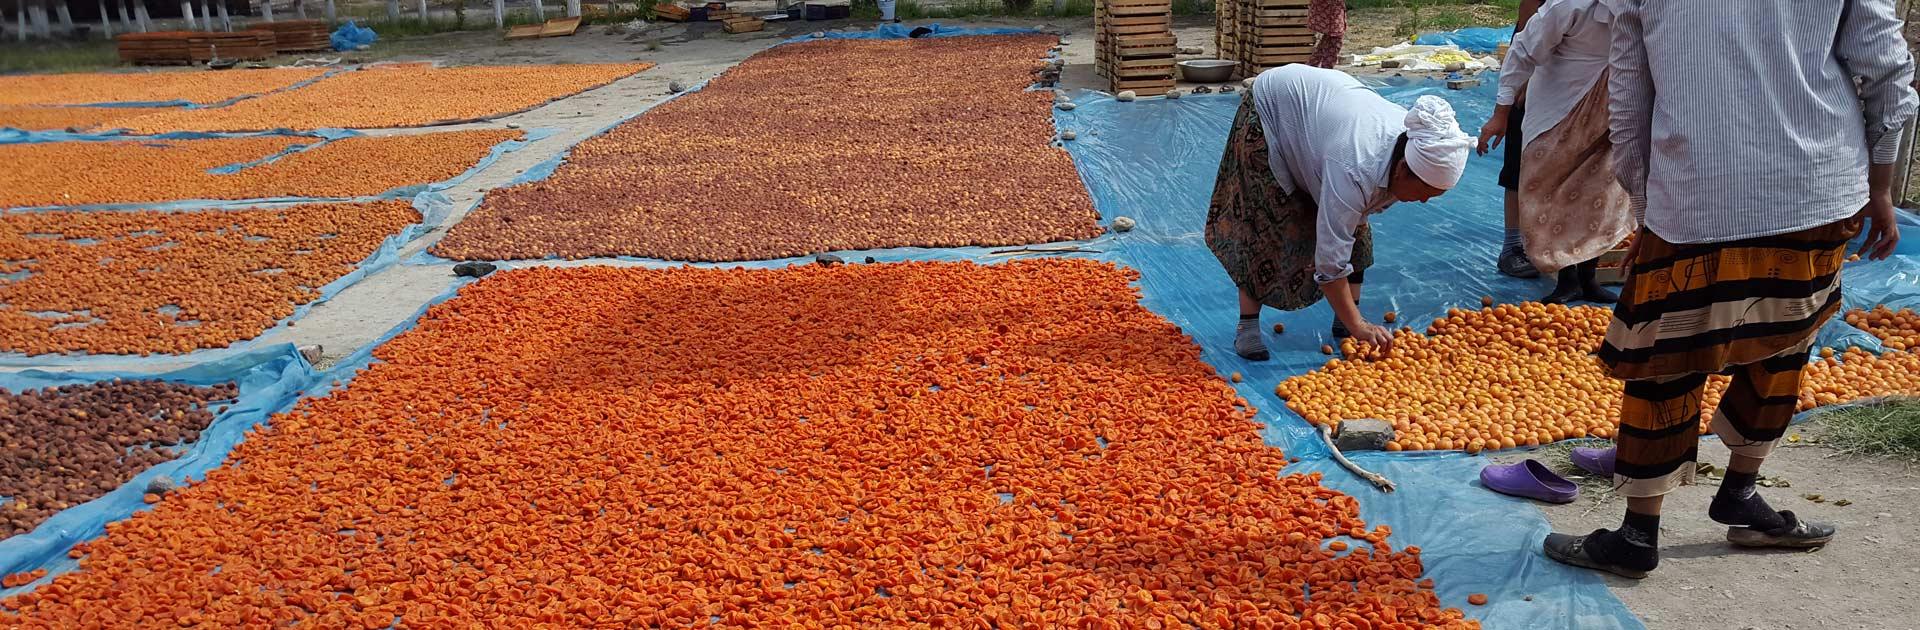 Fergana Uzbekistan Dried apricot fruits in the field